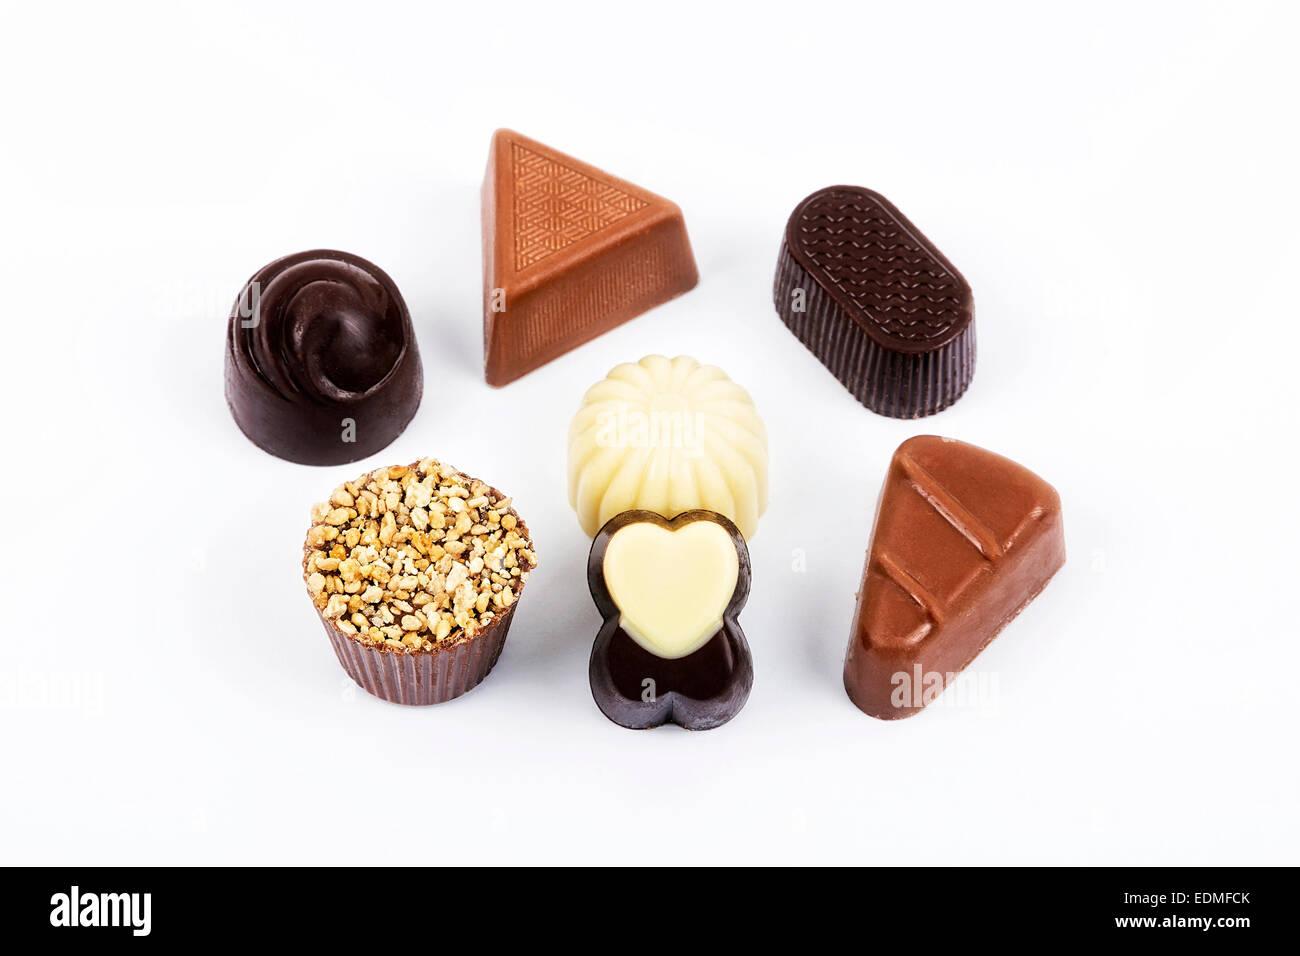 Chocolates - Stock Image